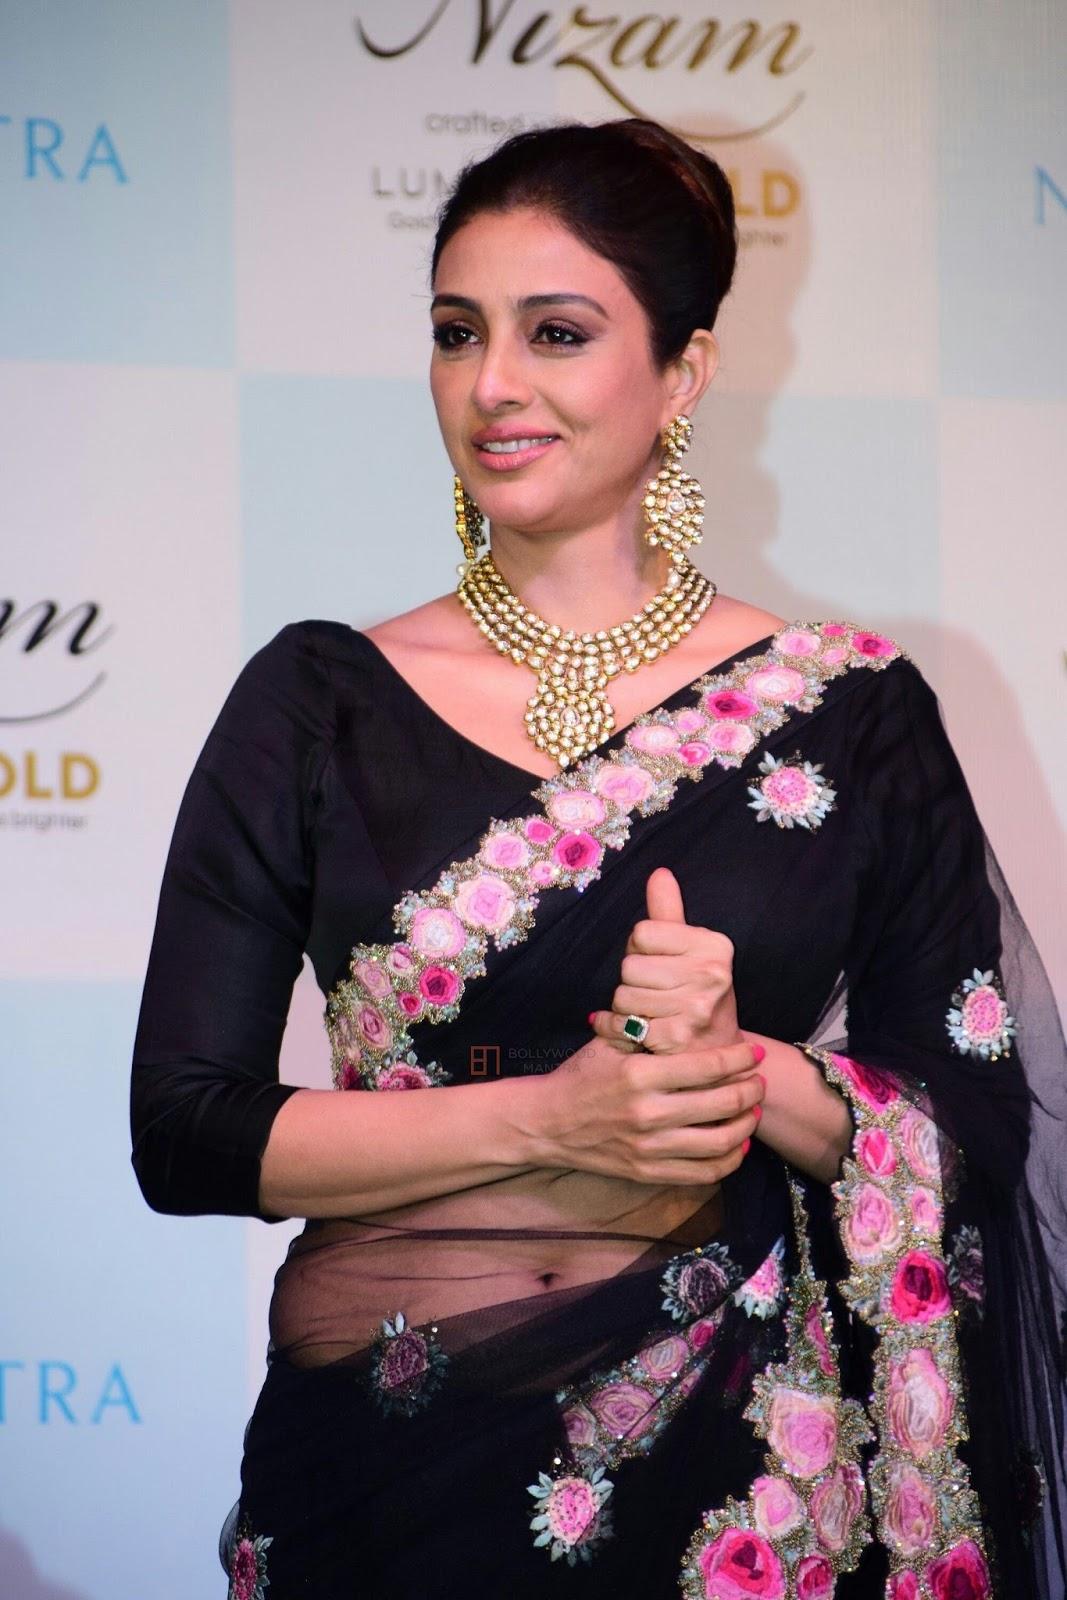 Nutabu Spanish Porn actress tabu navel show in black transparent saree